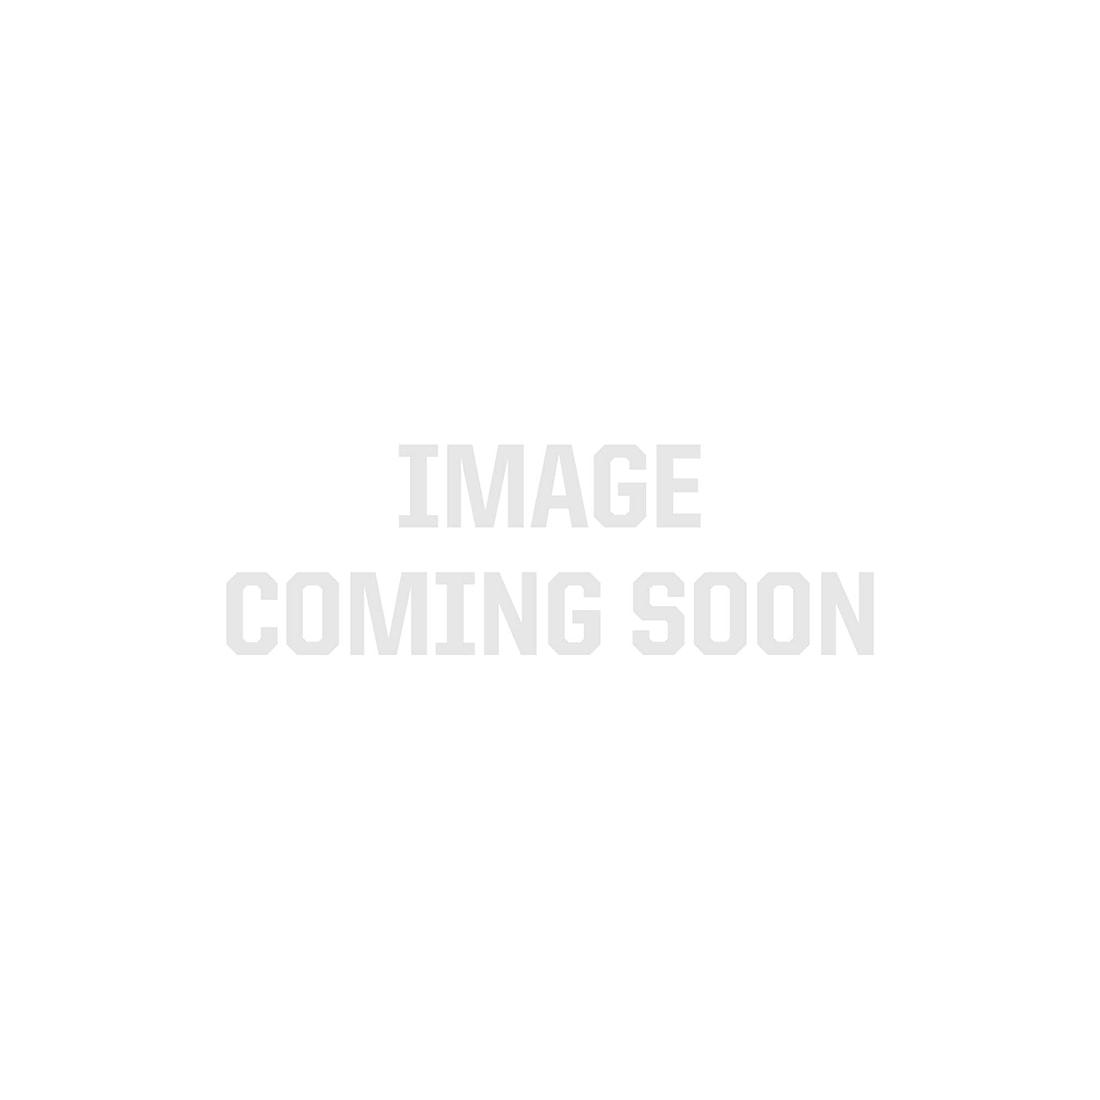 Daylight White 5050 Single Row CurrentControl LED Strip Light, 60/m, 12mm wide, Sample Kit